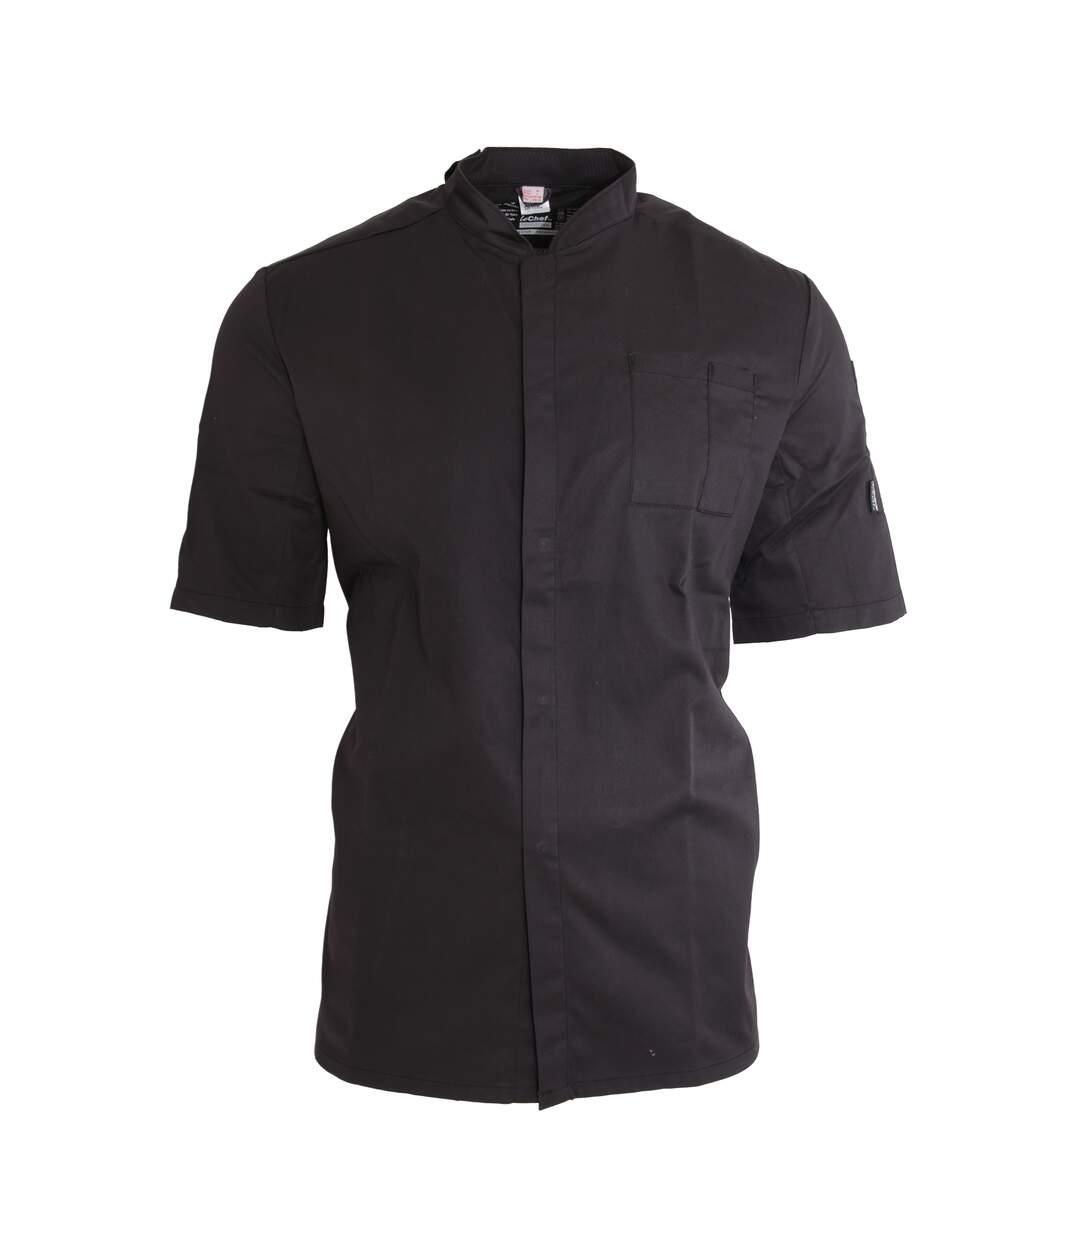 Le Chef Unisex ThermoCool Chefs Prep Jacket (Black/Black) - UTPC2704